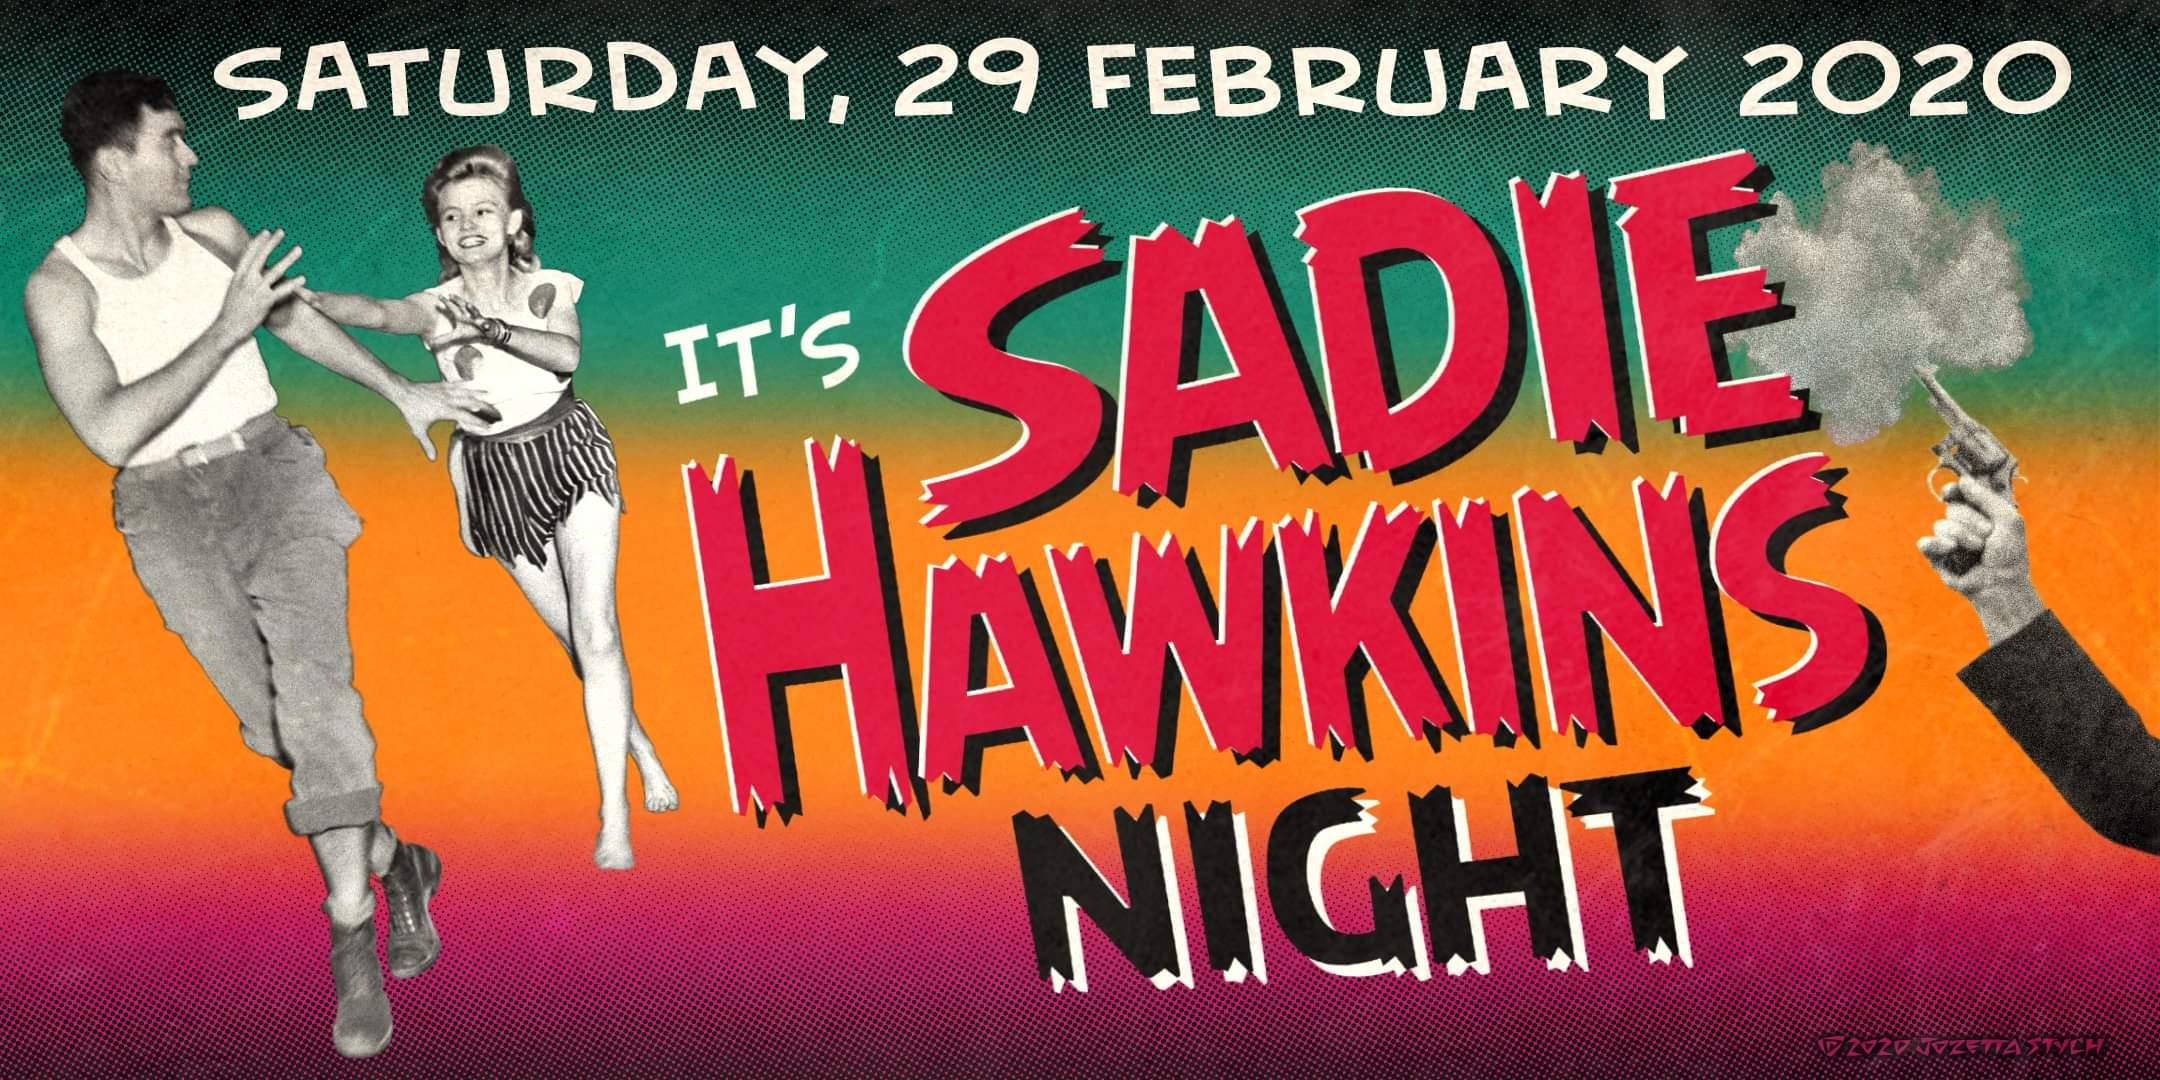 Sadie Hawkins Night